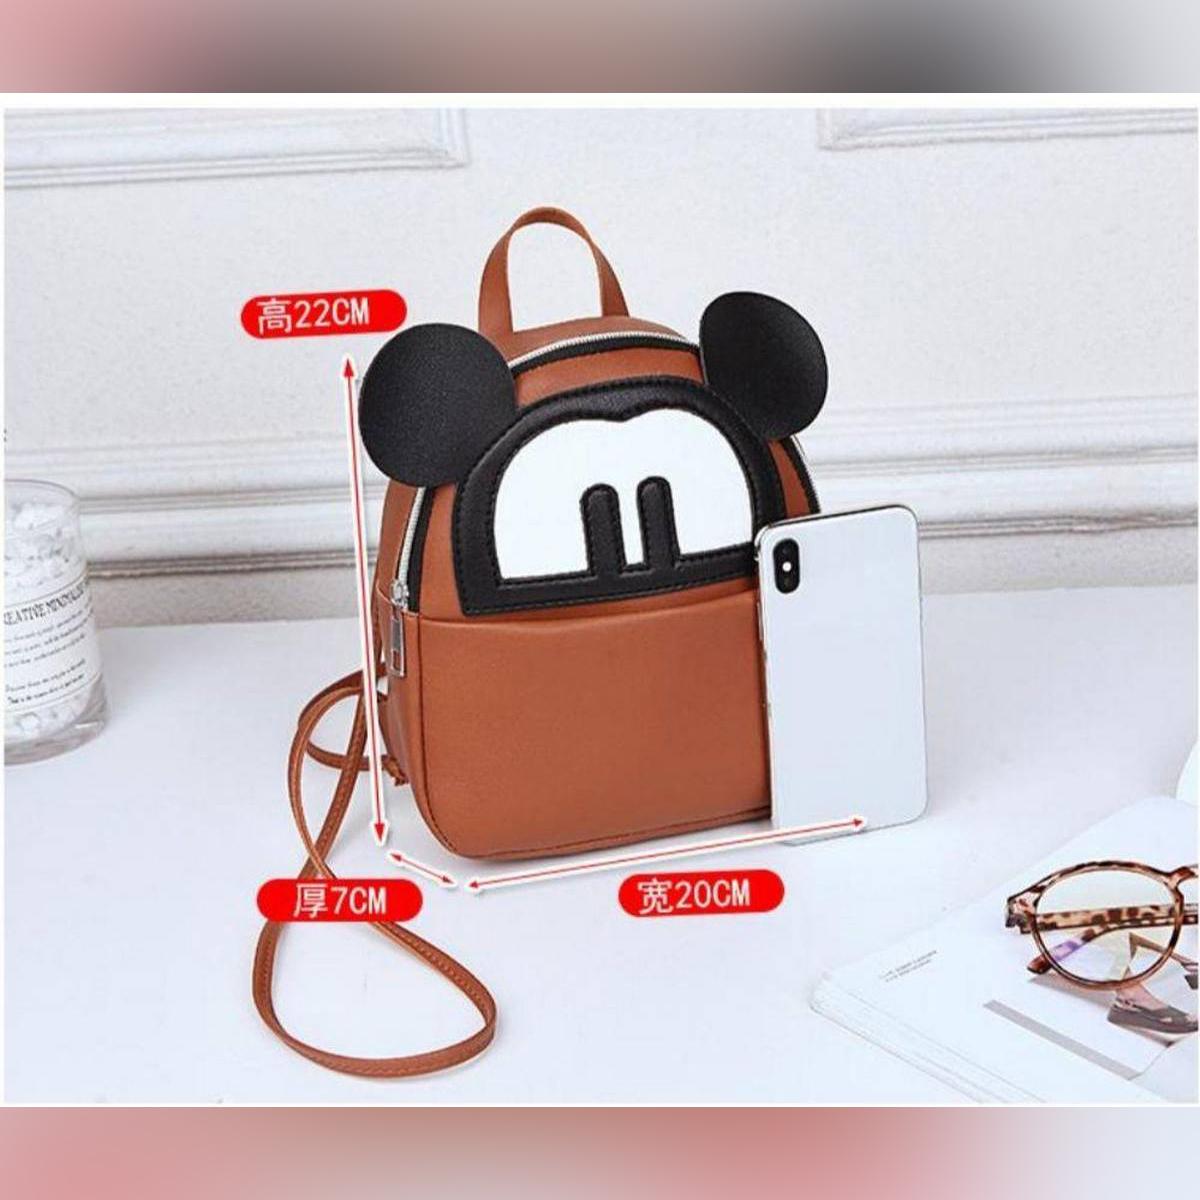 3 Styles Use Girls Mini Bear Bag,(Backpack+Side Shoulder Bag,Hand Carry)